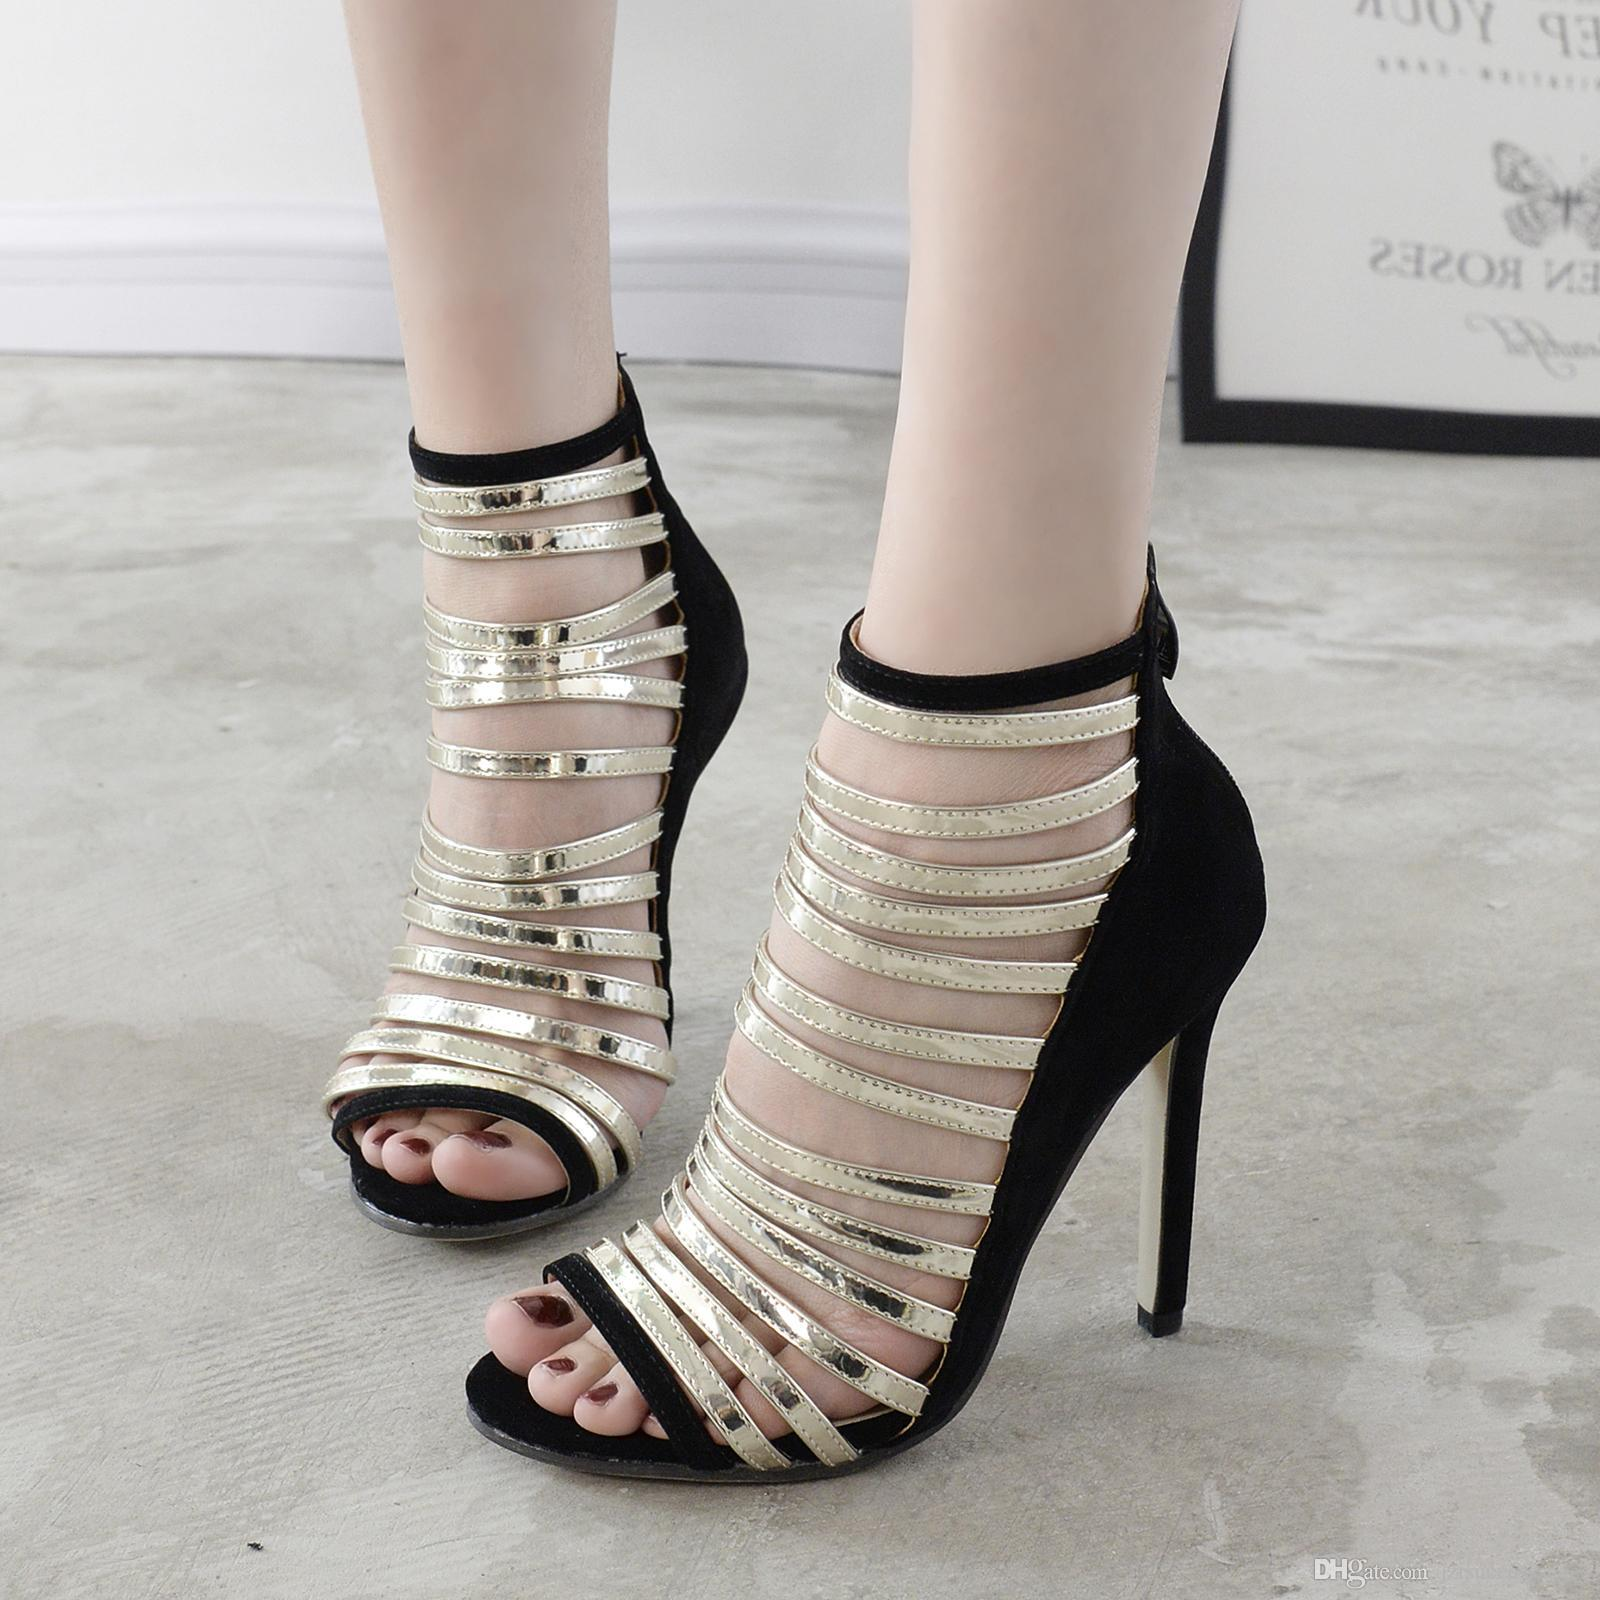 a7e3435424e0 Arden Furtado 2018 summer boots new style sexy high heels 12cm gladiator  stilettos big size narrow brand night club shoes woman ladies Item NO   427512